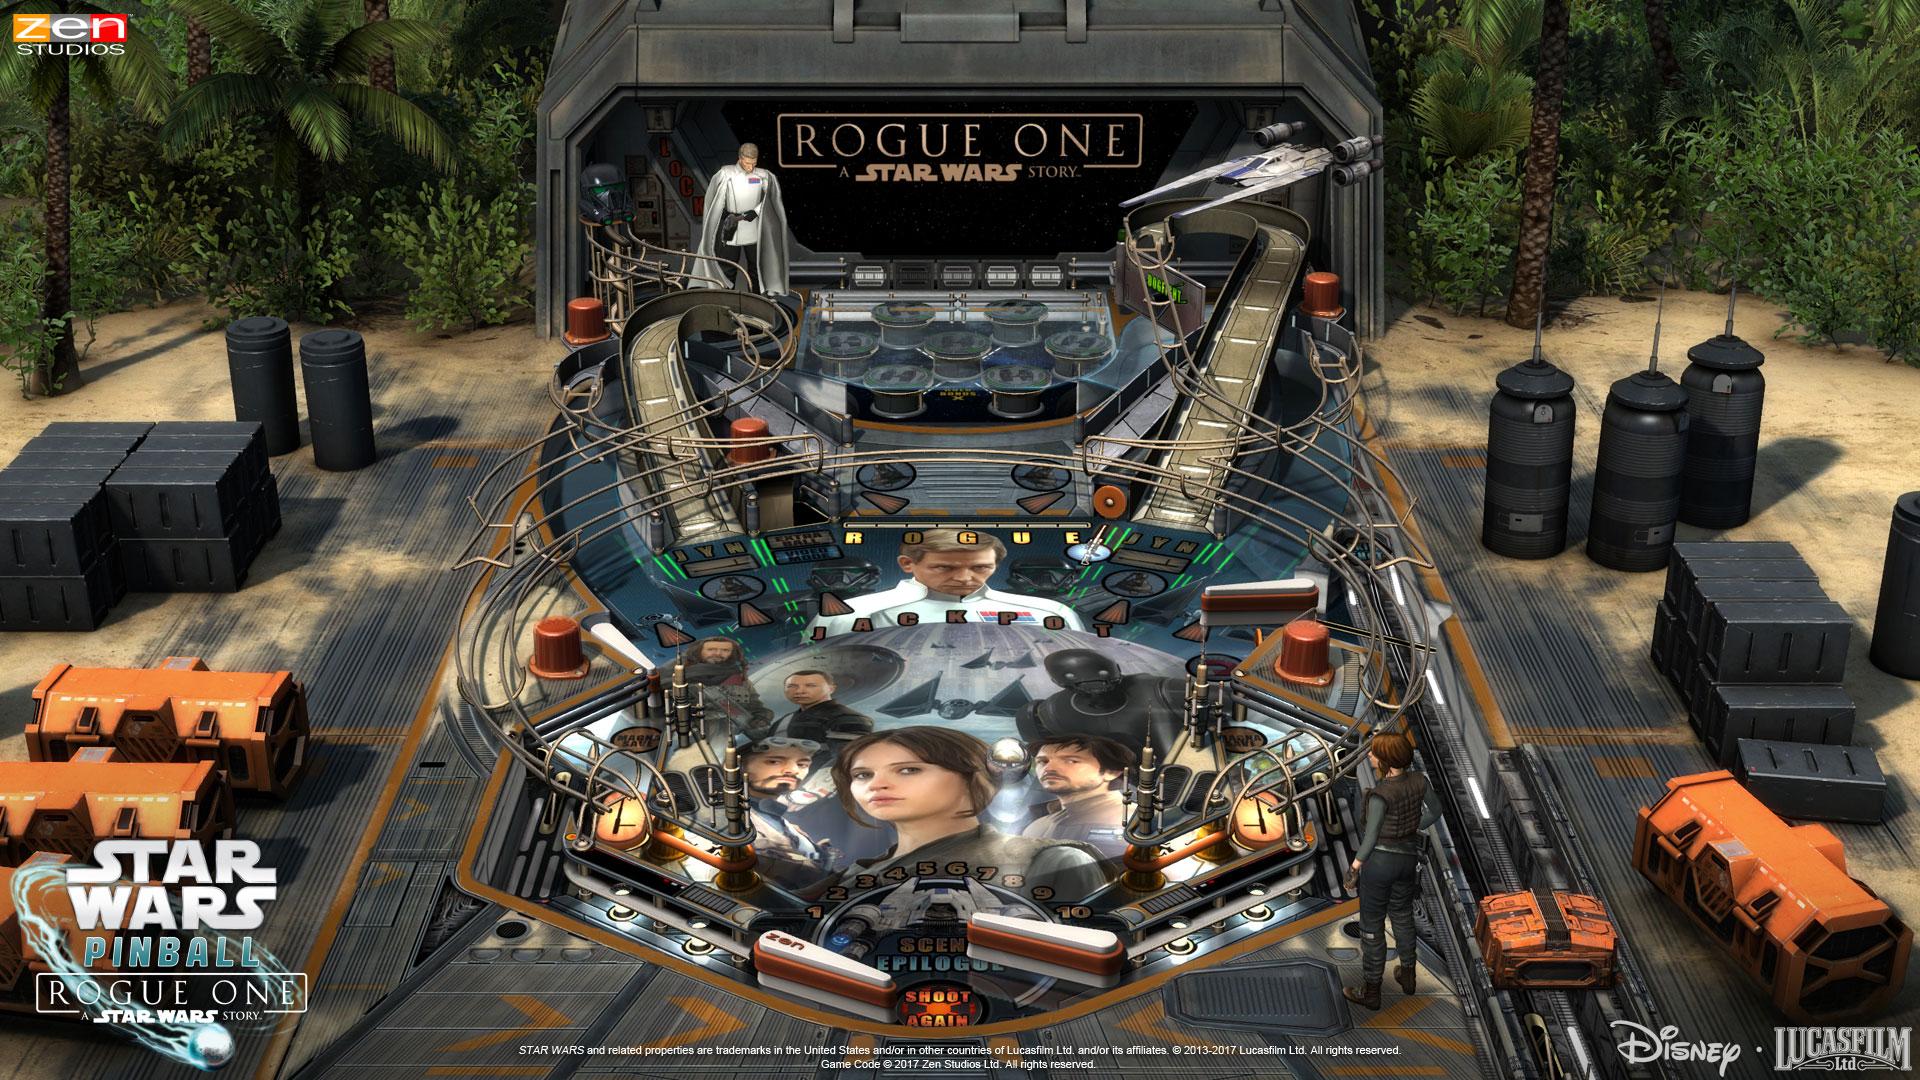 Rogue One Pinball Table